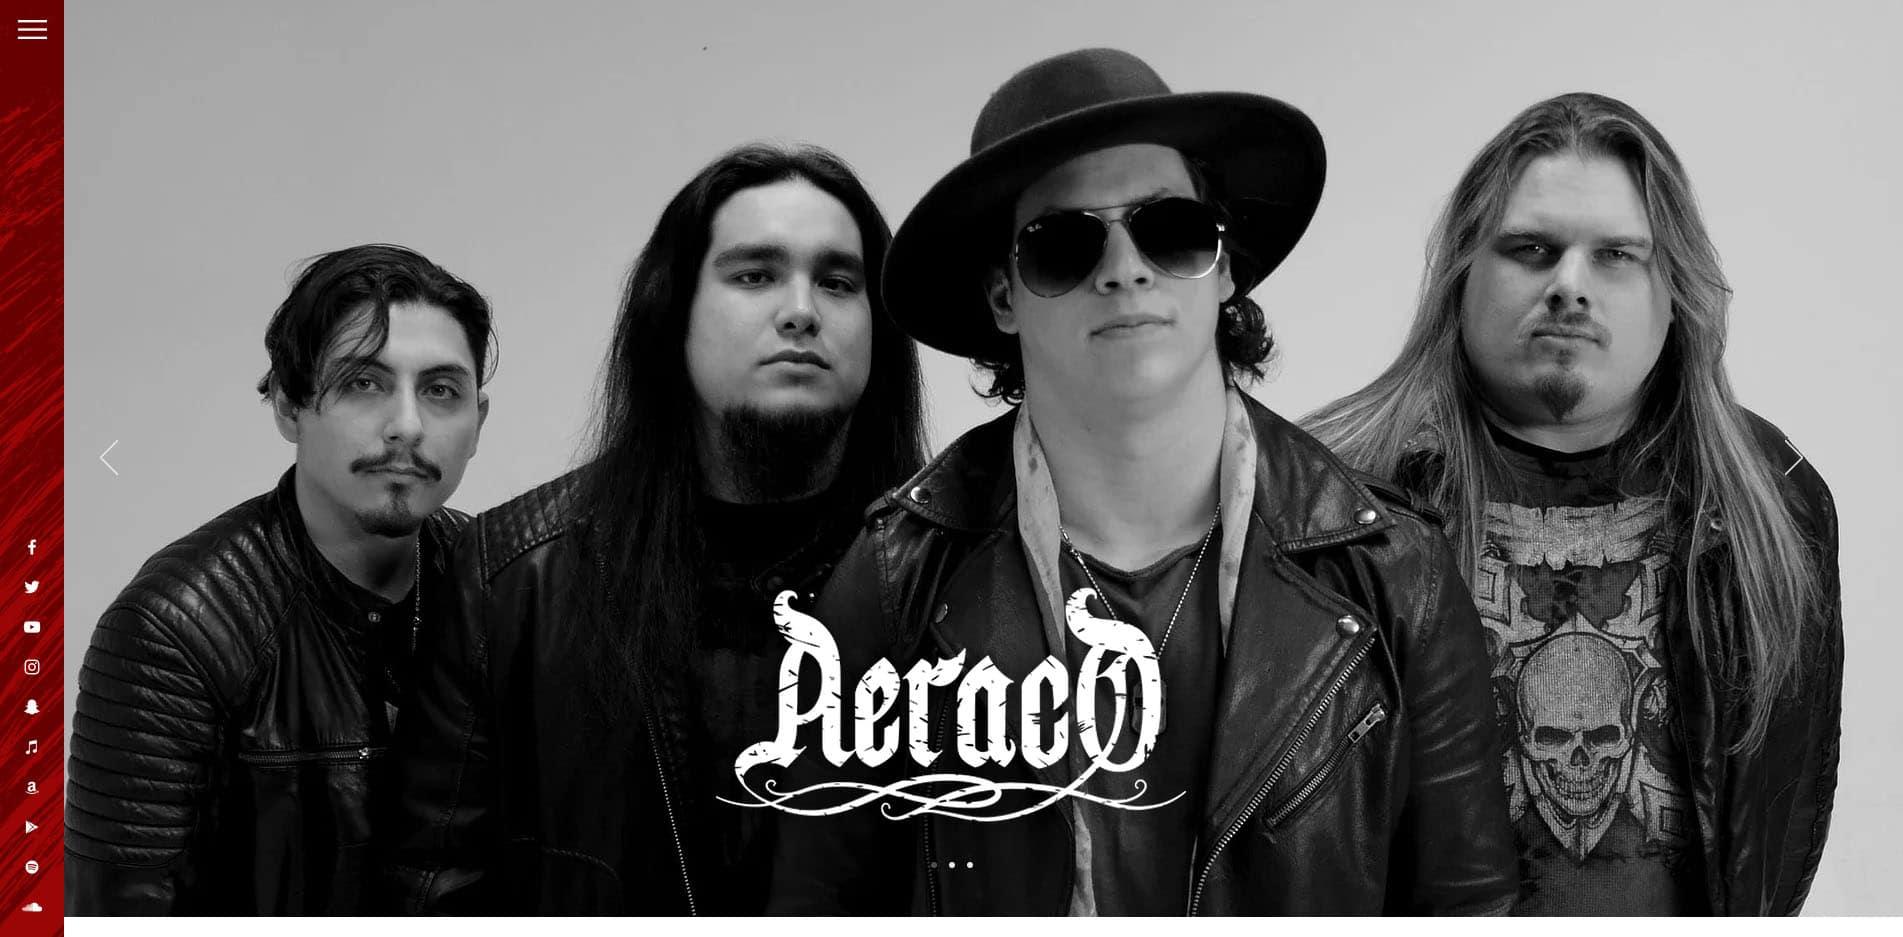 Aeraco – Website